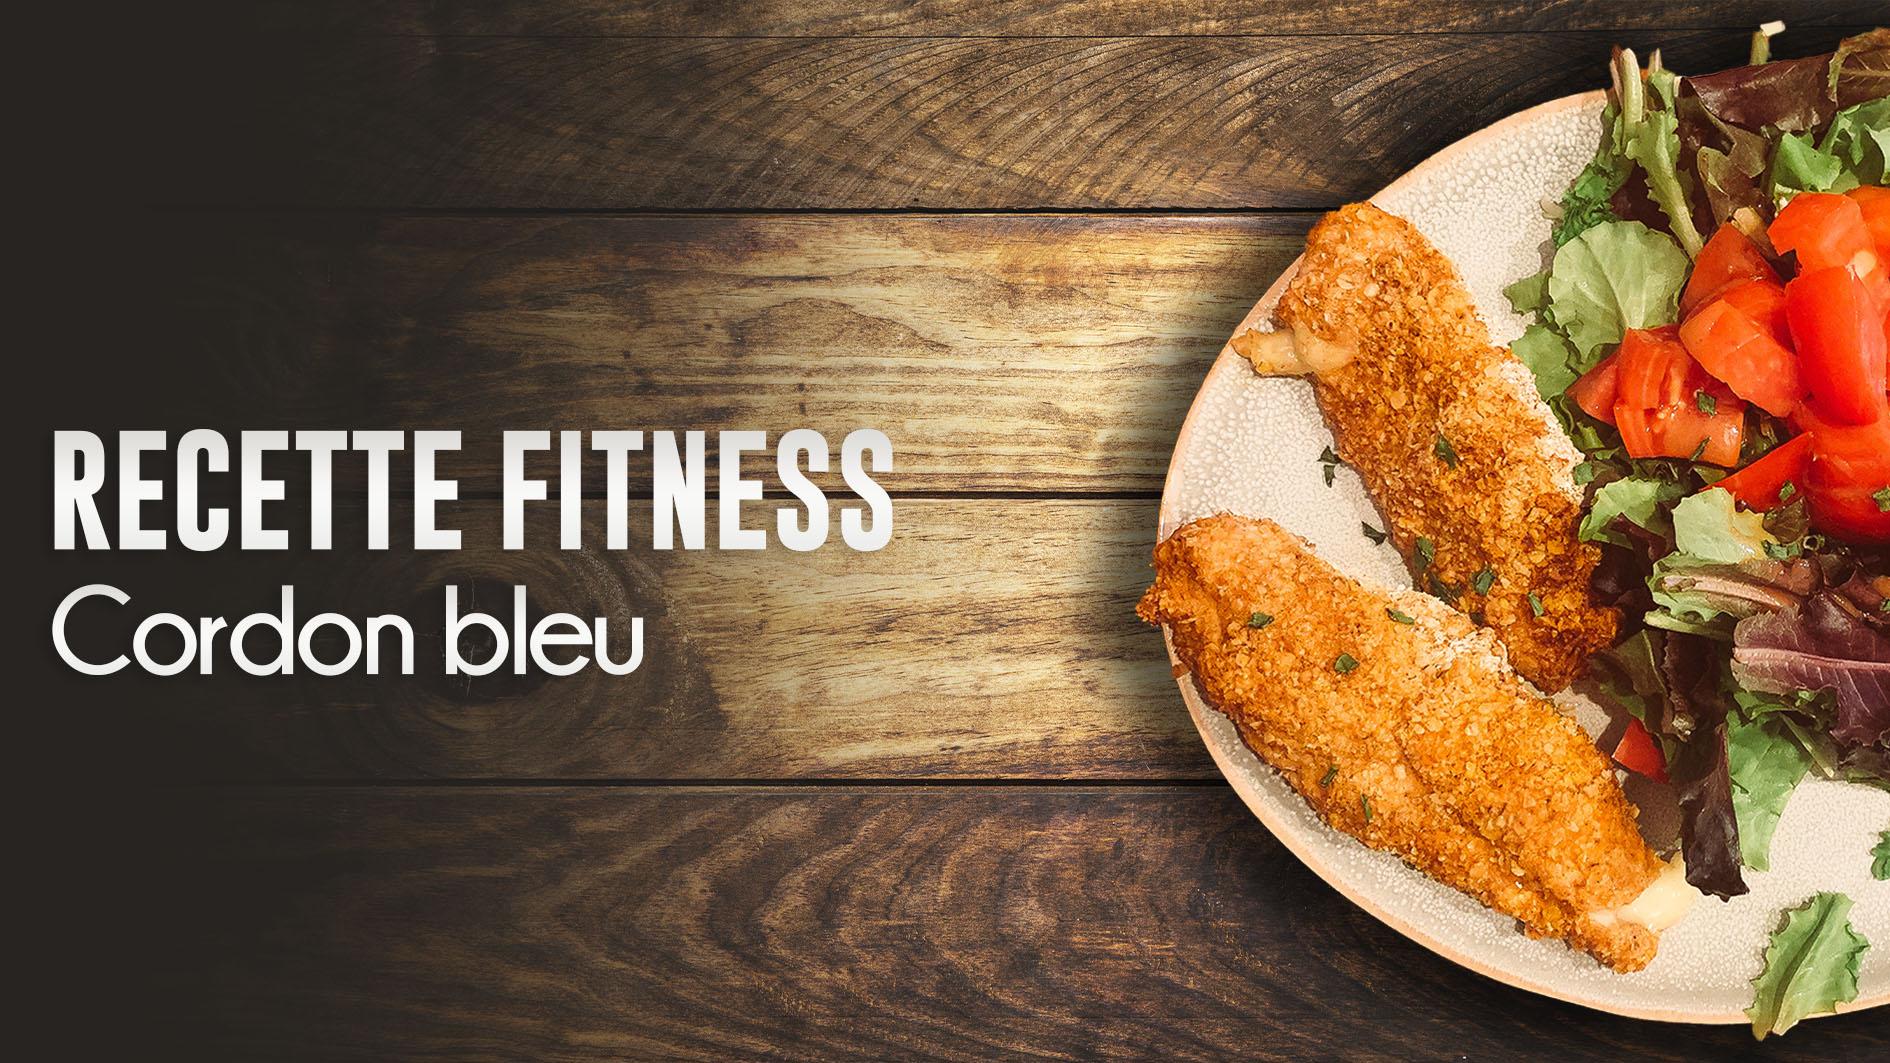 recette cordon bleu fitness